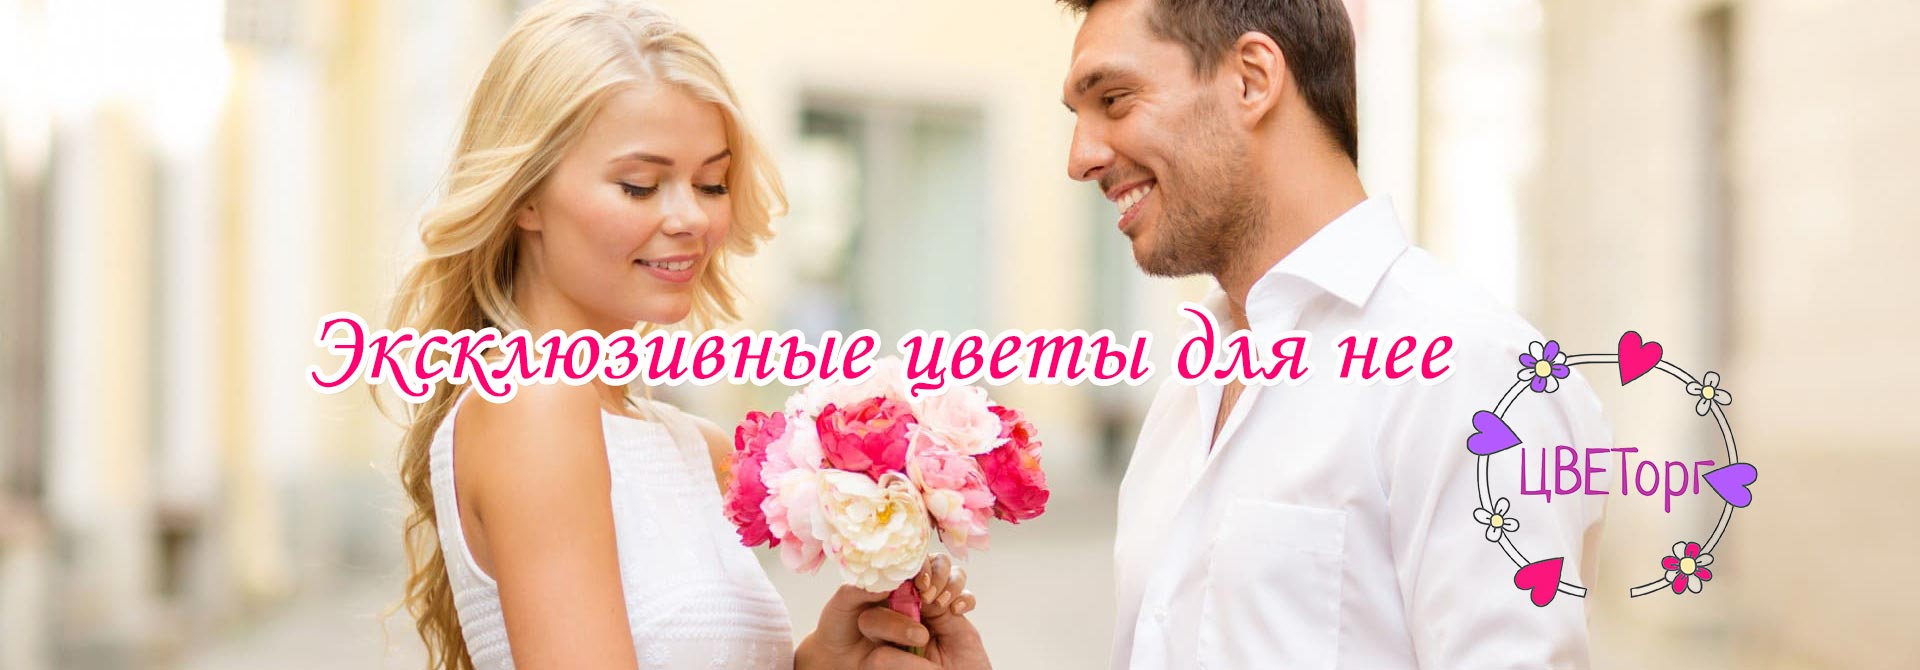 title_6077cea146fbe11457795621618464417